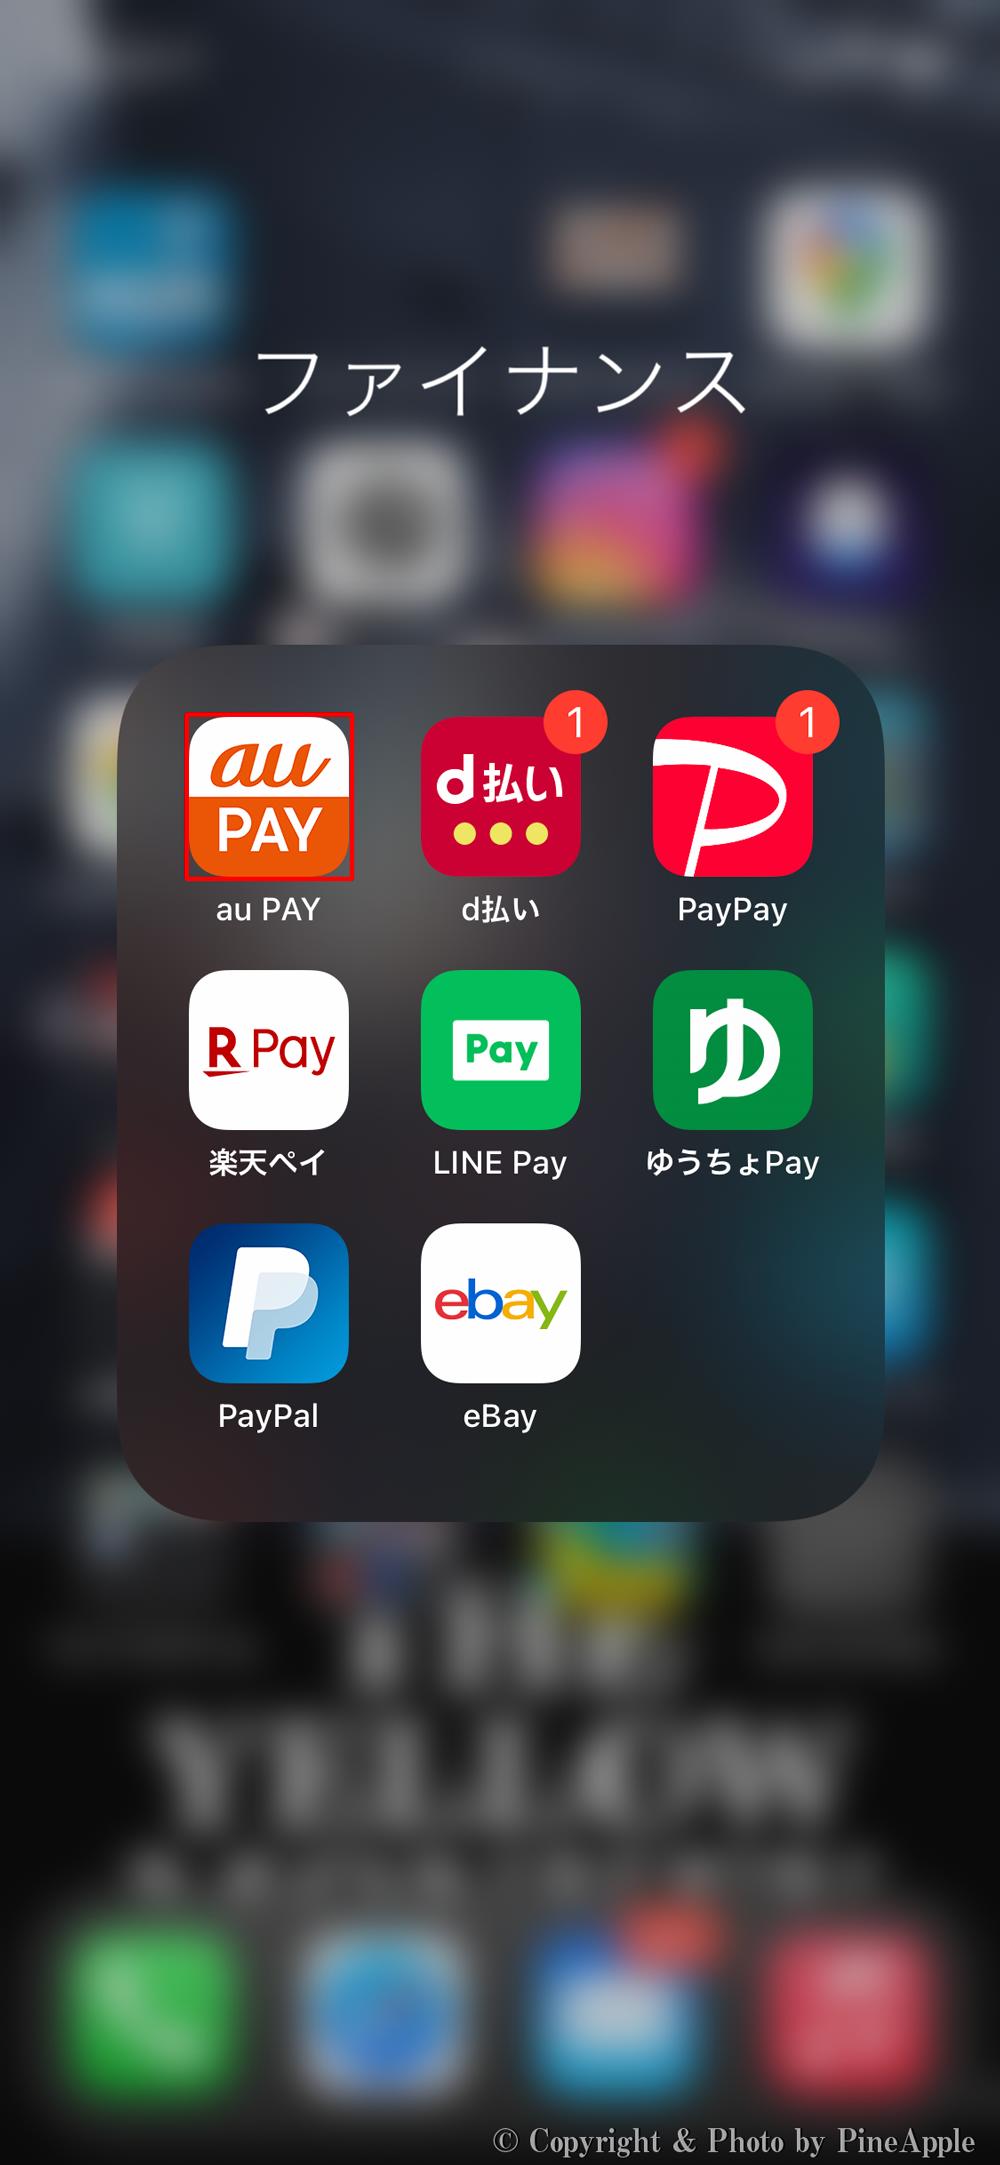 au PAY:au PAY をタップ